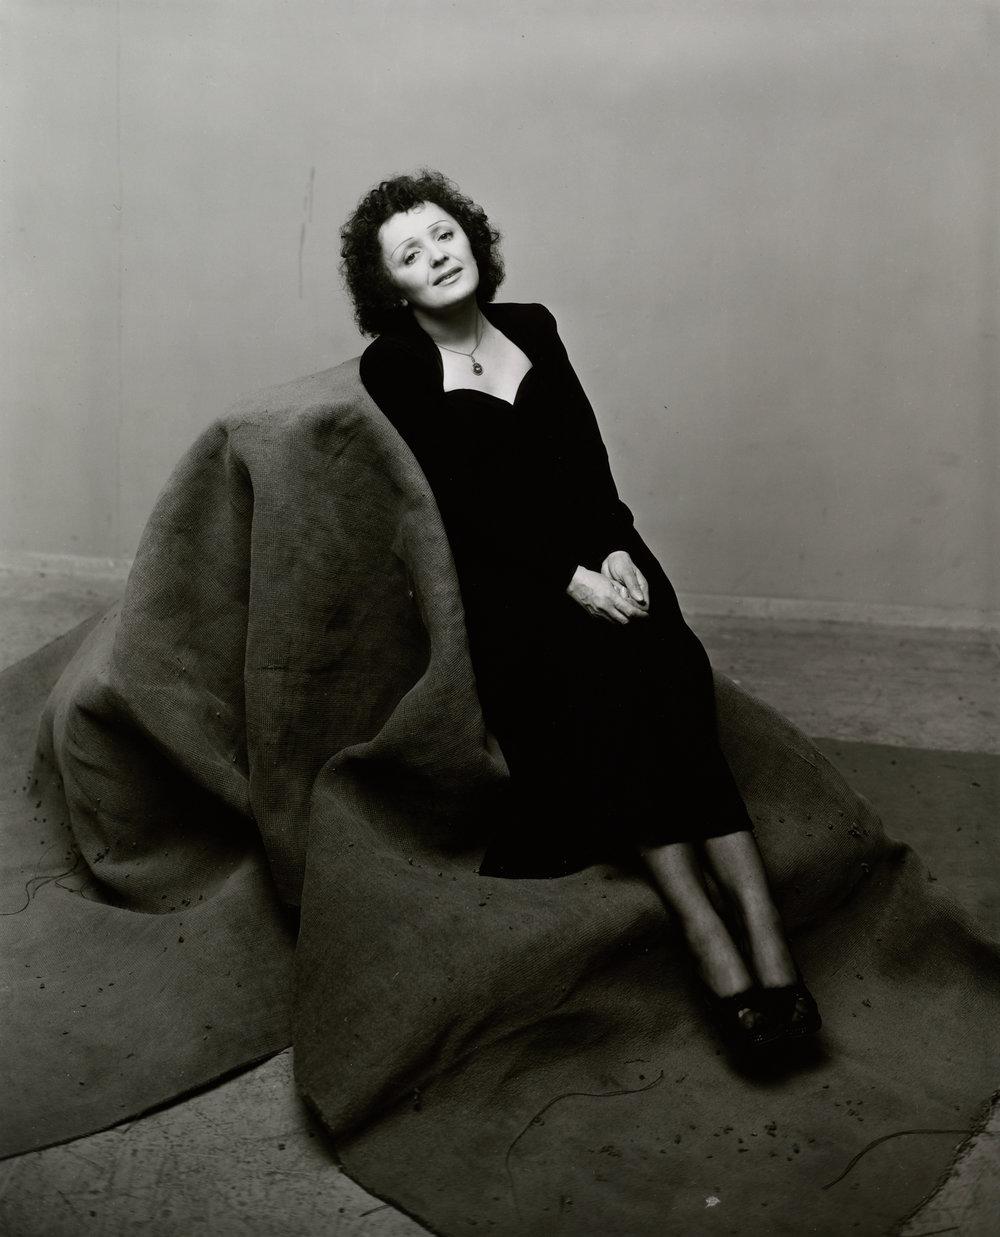 Fotó: Irving Penn: Édith Piaf (1 of 3), New York, 1948, Gelatin silver print © The Irving Penn Foundation